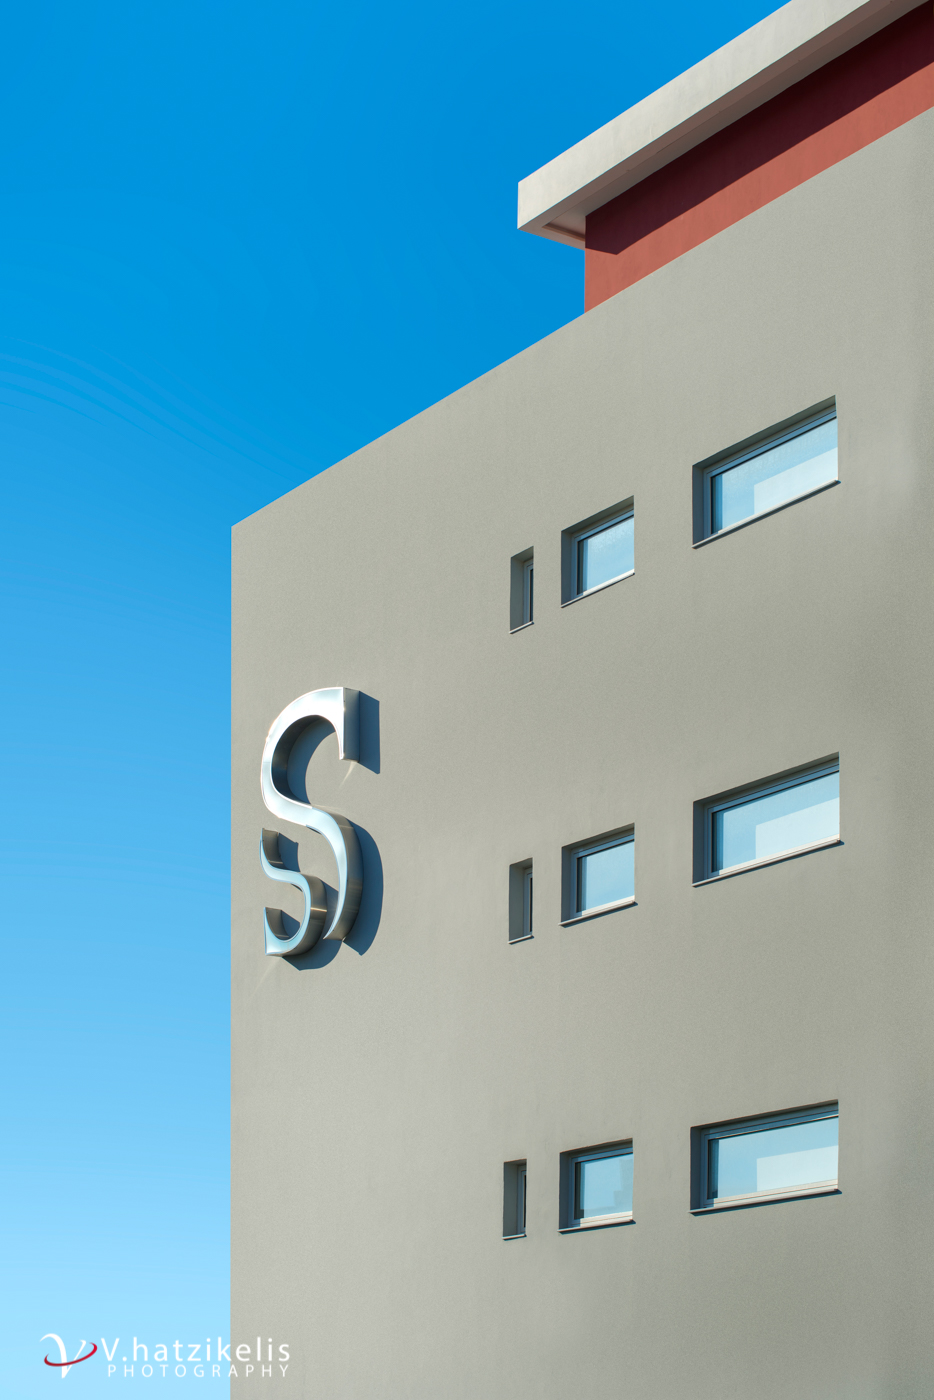 v hatzikelis photography Semiramis hotel-27